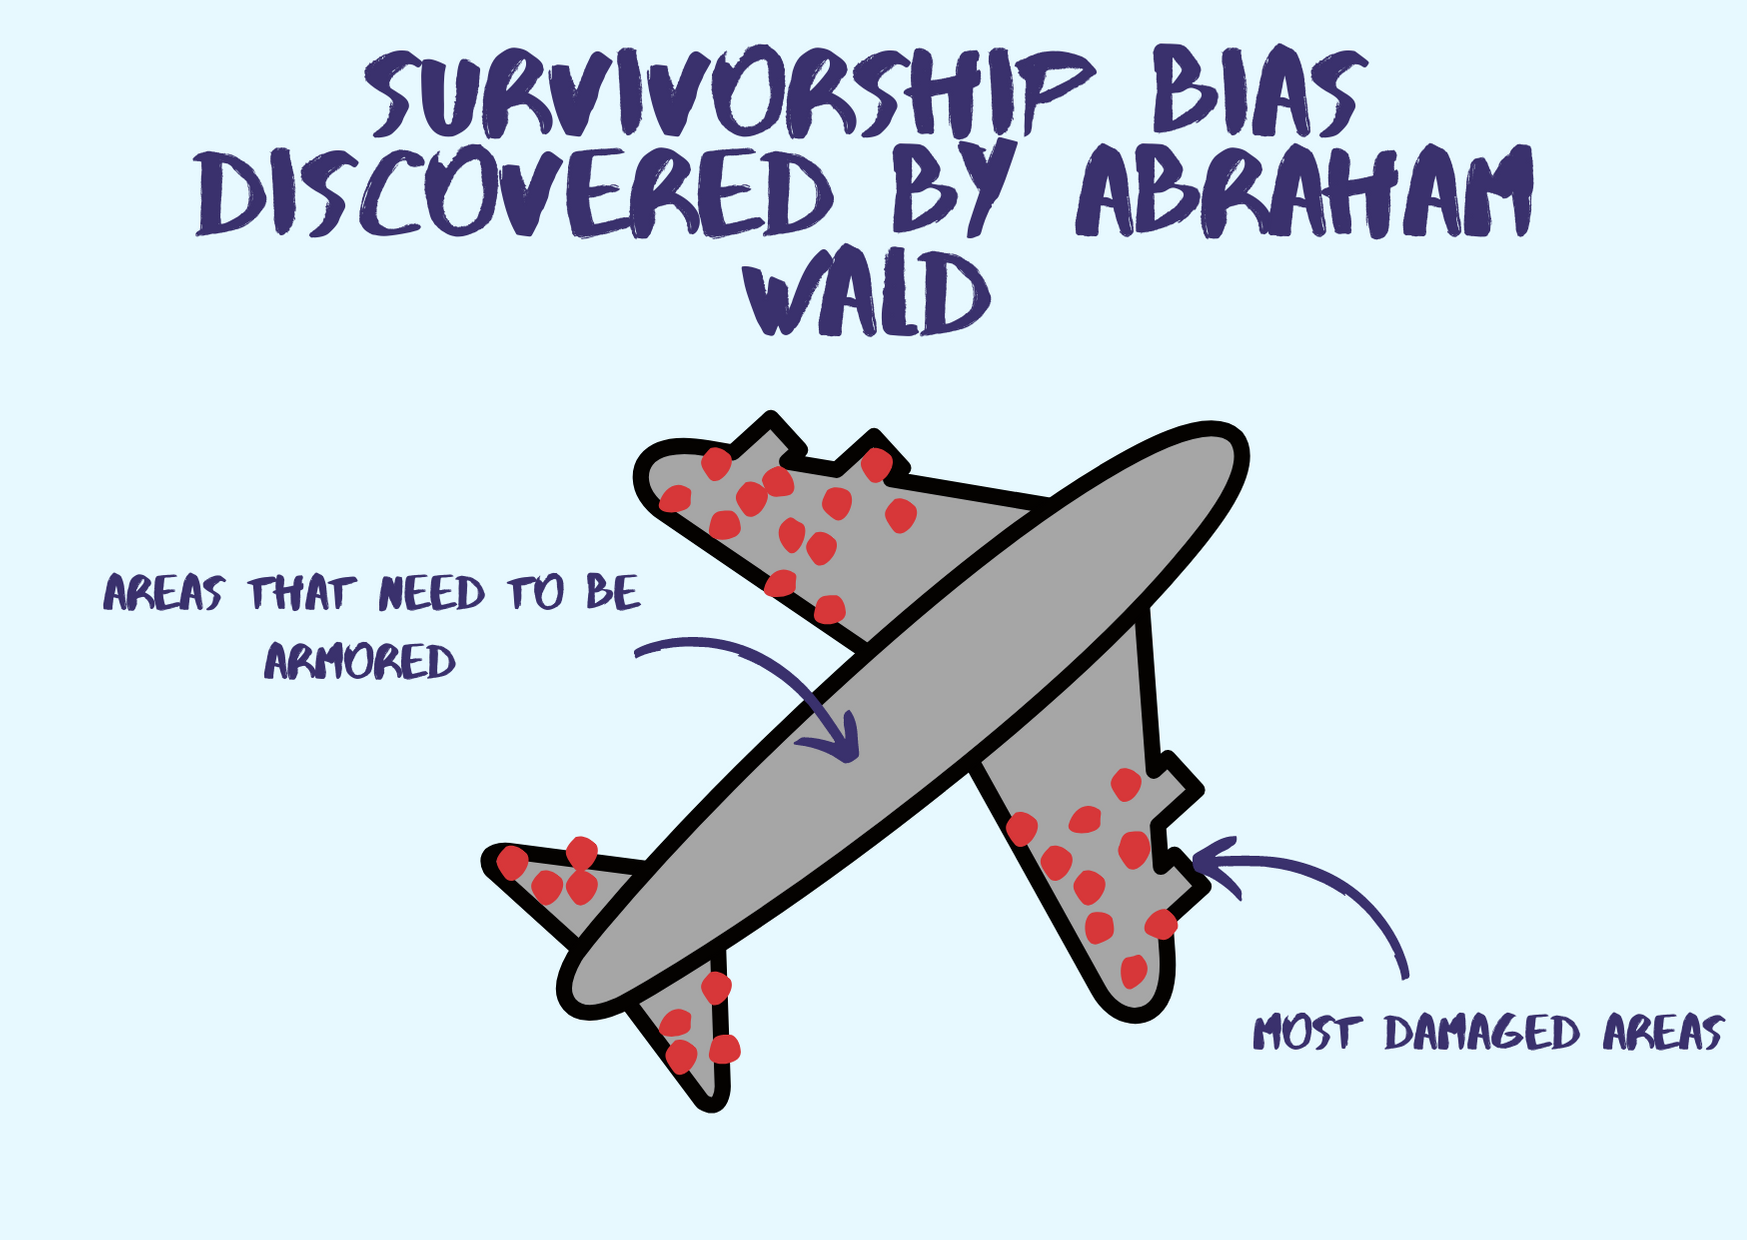 Survivorship bias by Abraham Wald